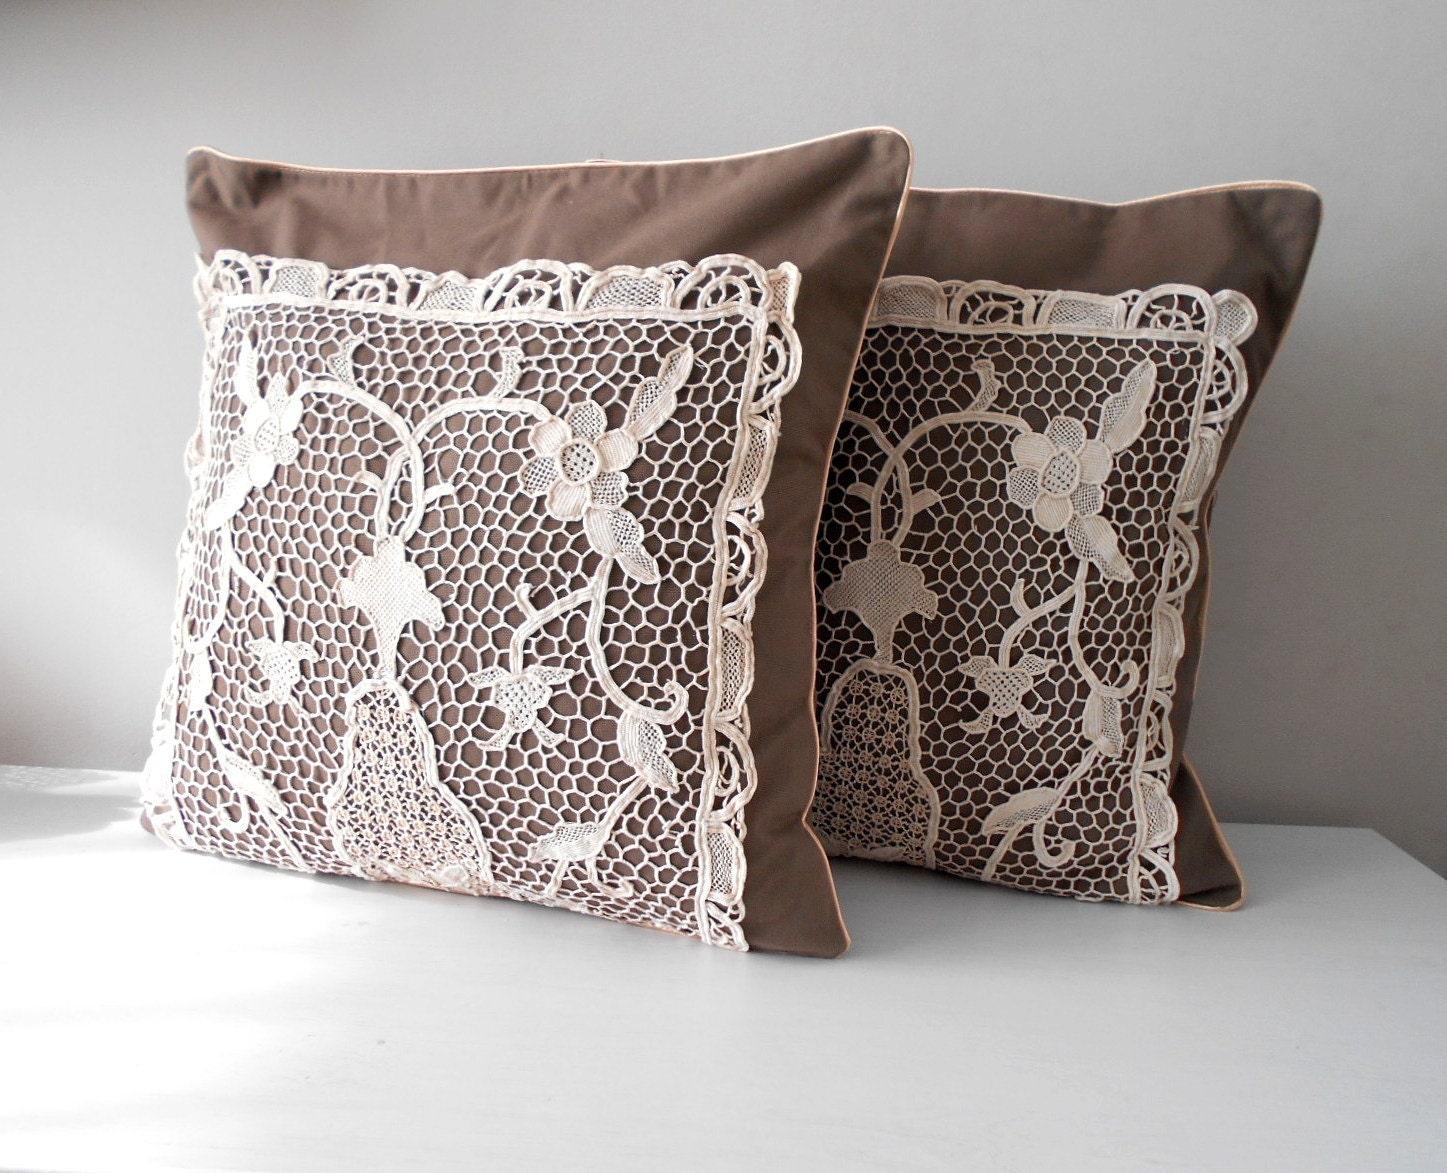 Decorative Pillows Rustic : Rustic Pillow Cover Set Decorative Throw Pillow Brown Pillow